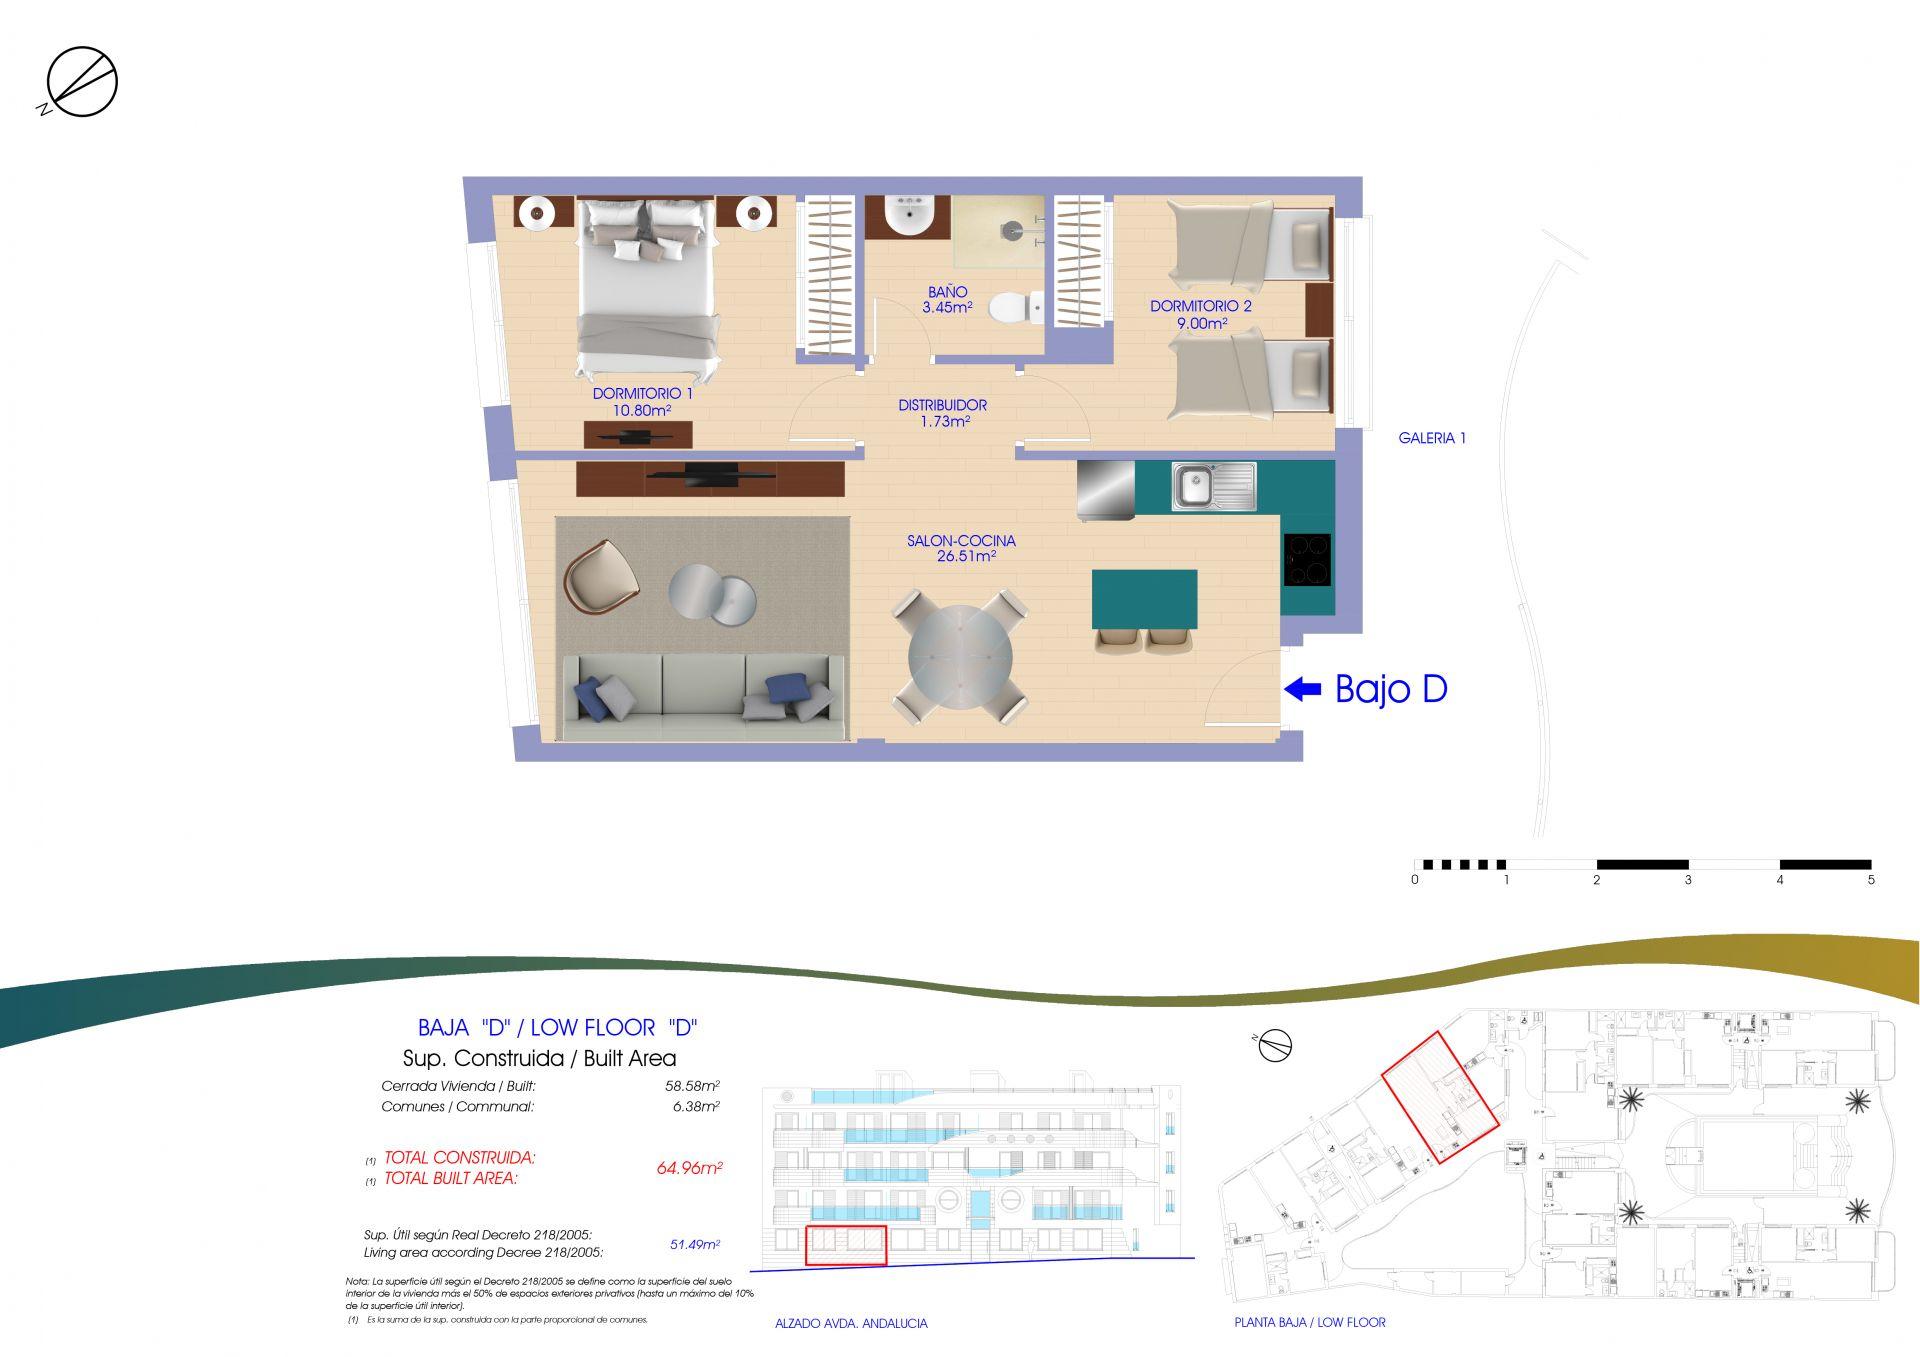 20201221 BAJO D  - Ventura Estepona | Compra de casa en Estepona